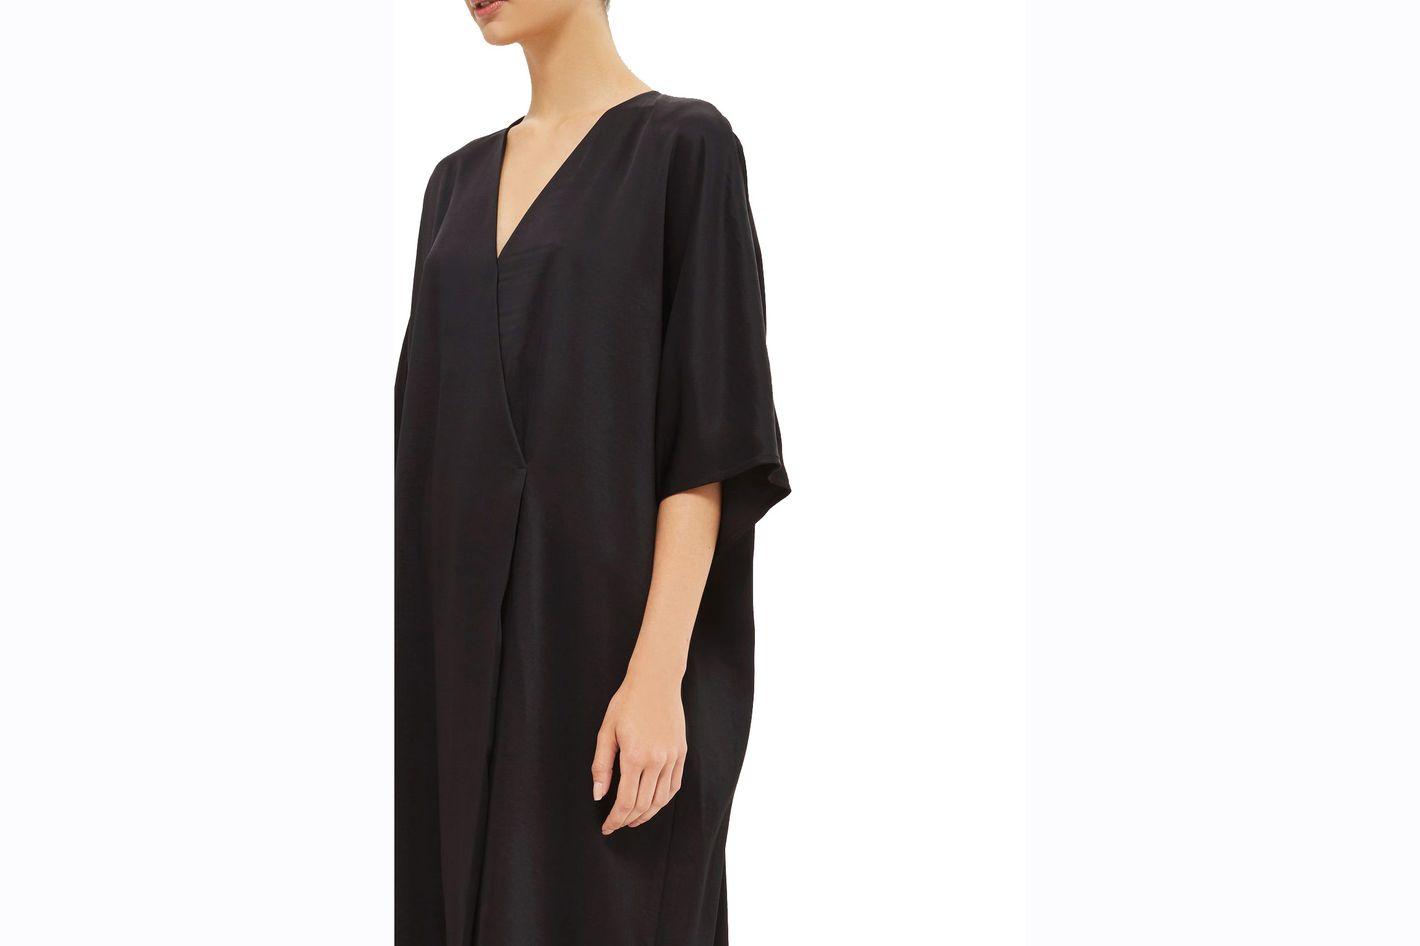 Topshop Crepe Kimono Dress